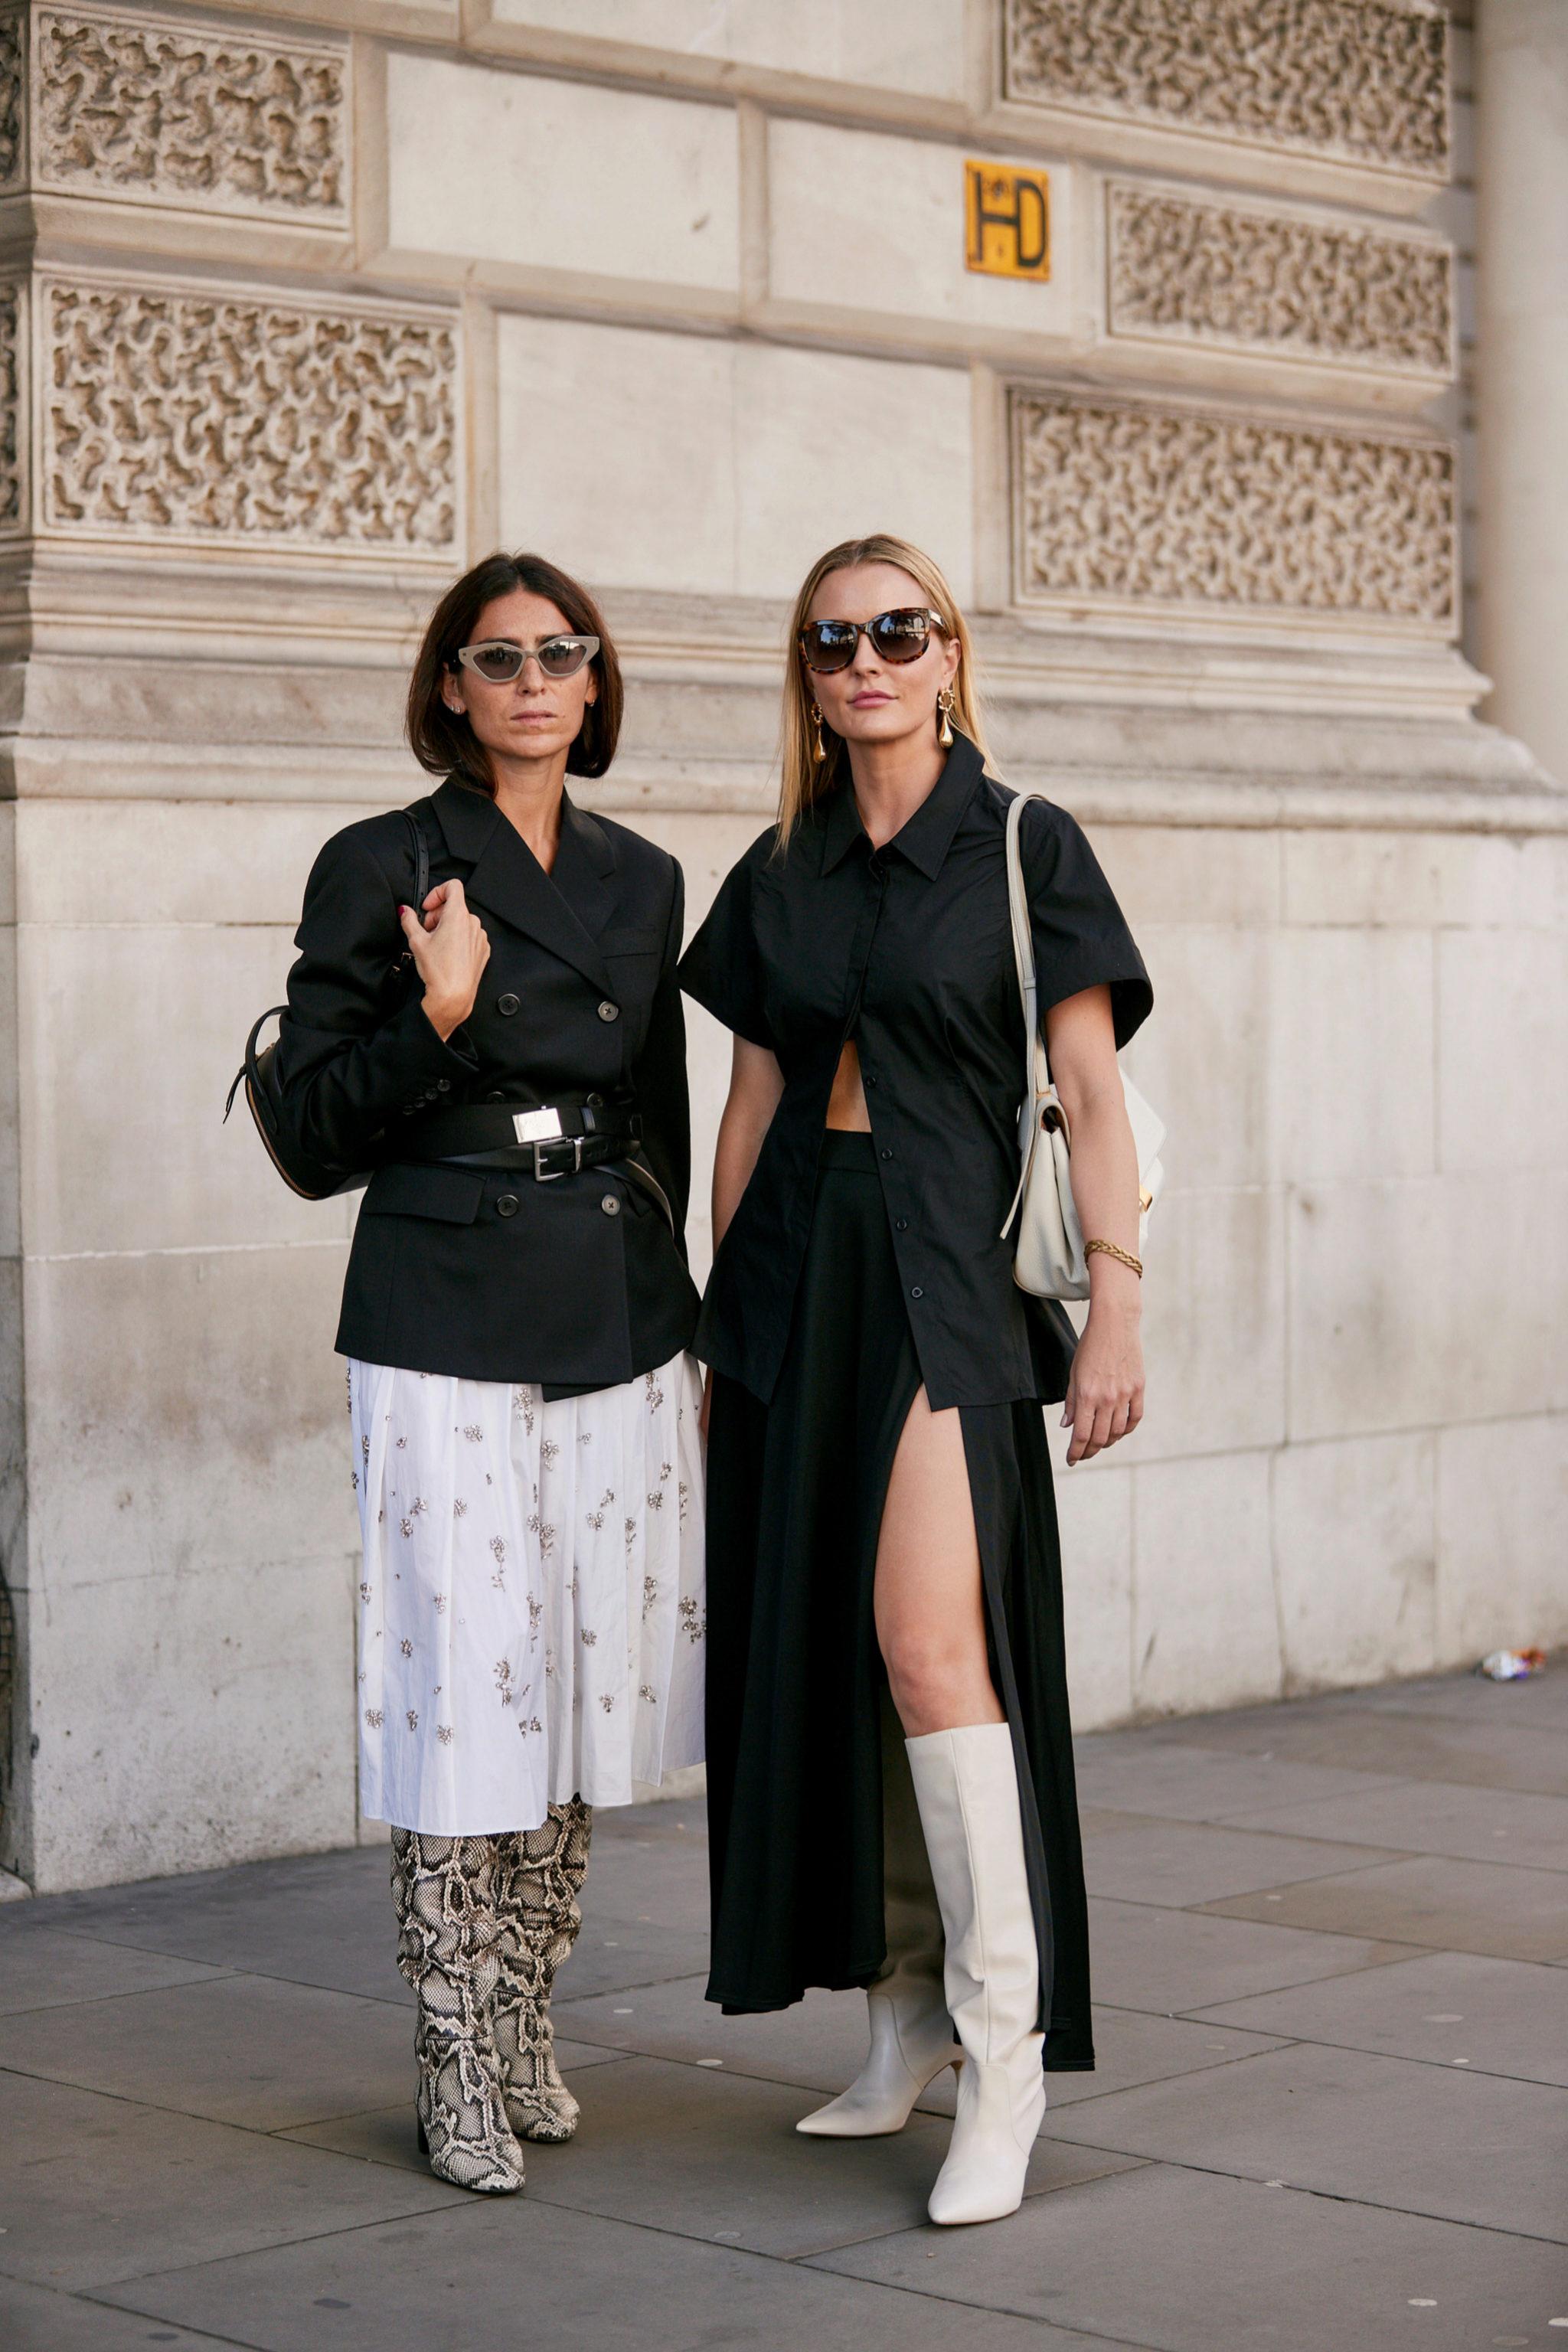 Hemos visto muchas botas altas en las 'fashion weeks'